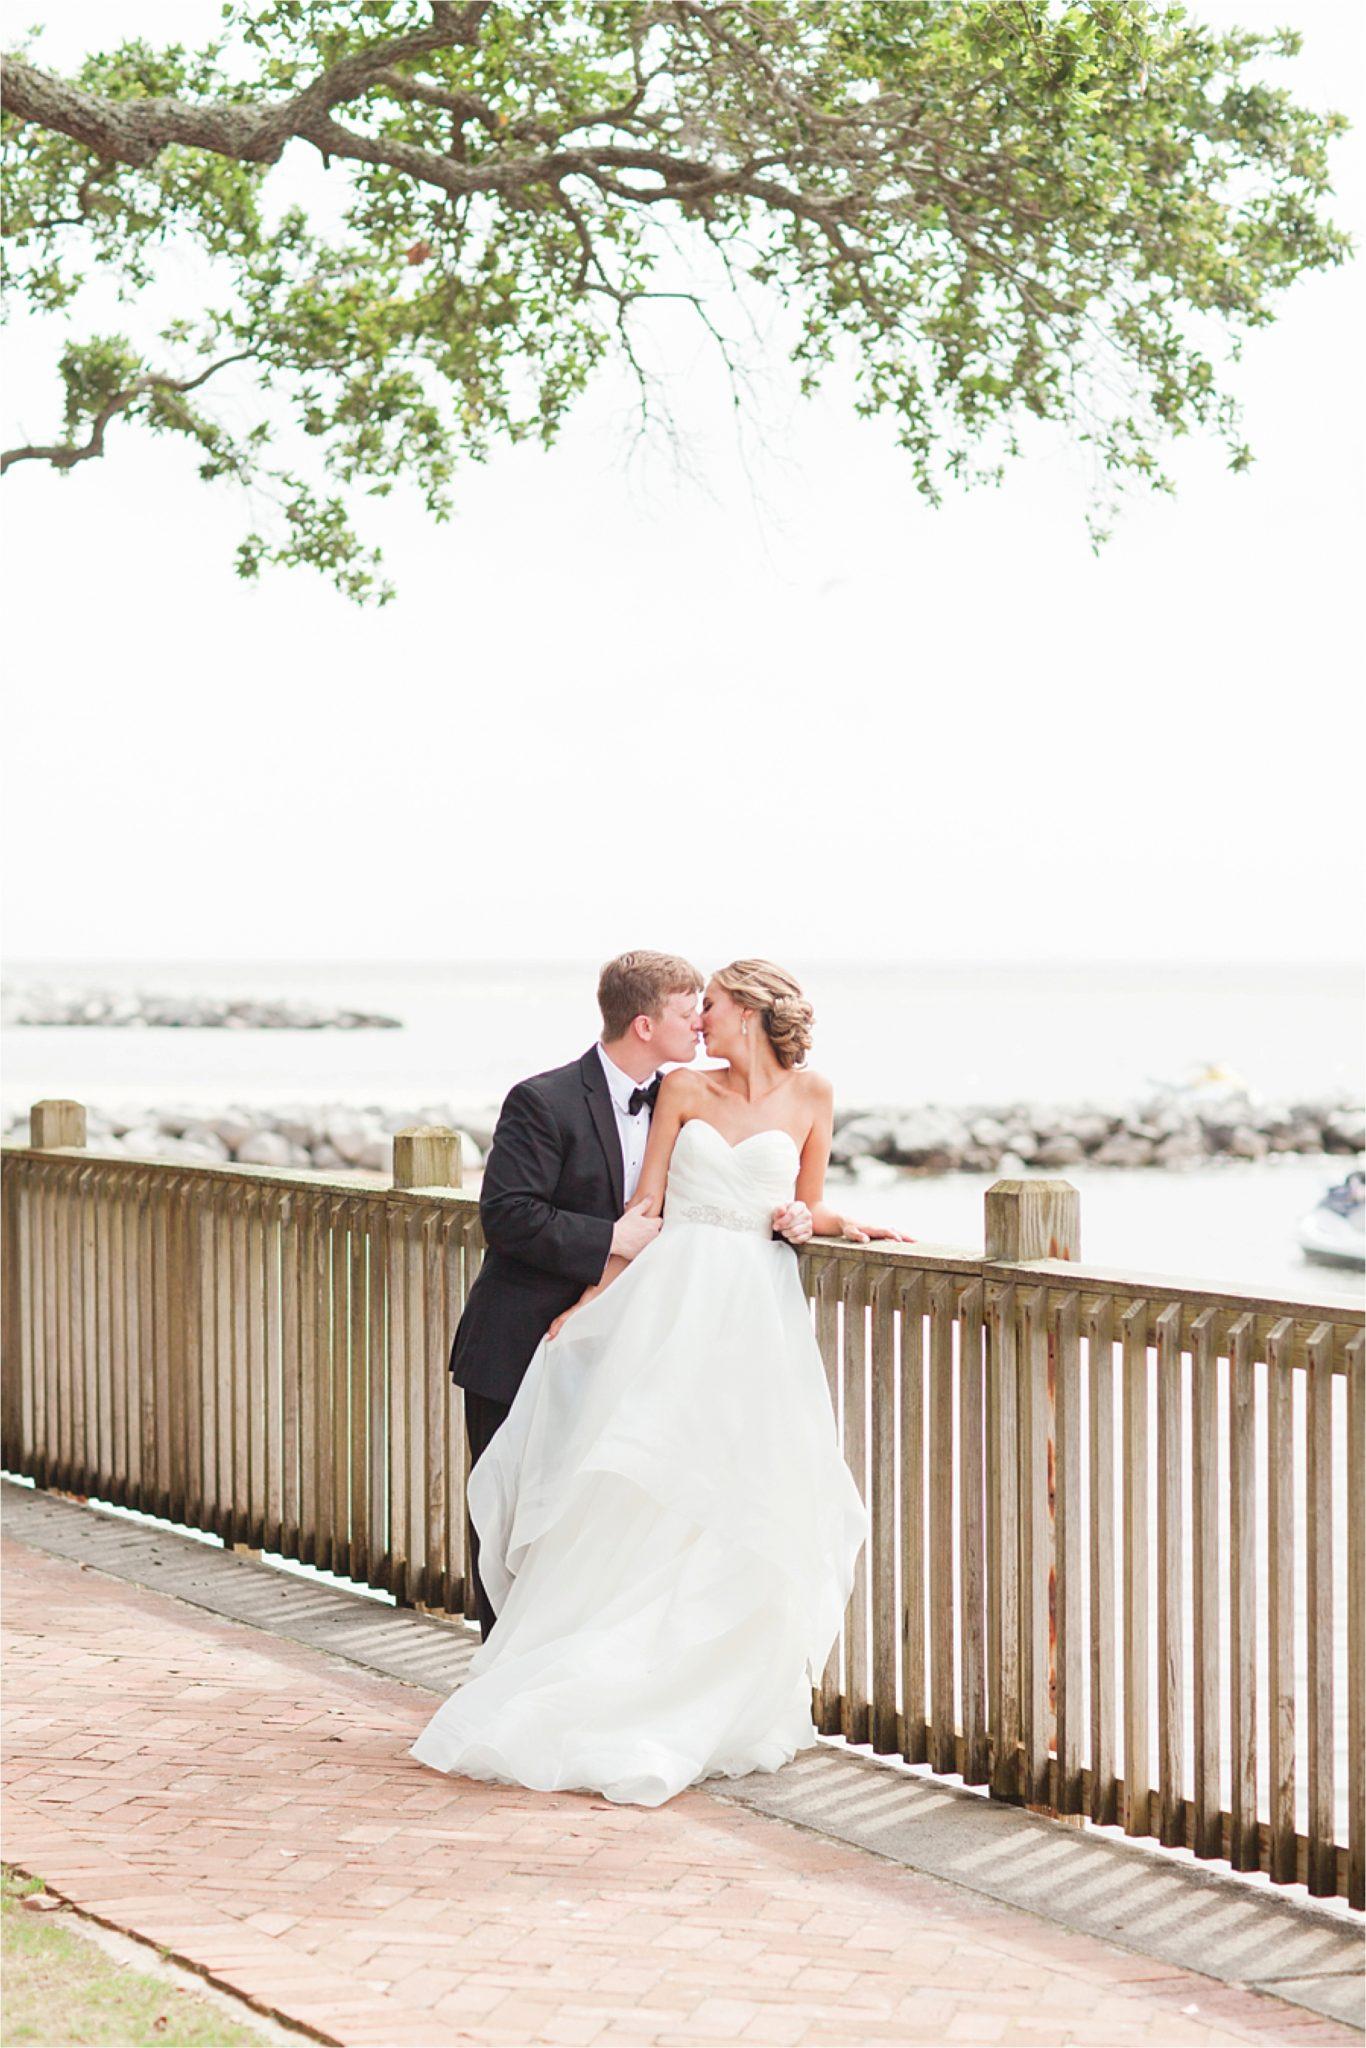 Classy Light Blue Wedding-Point Clear, Alabama Wedding Photographer-Wedding dress-Wedding gown-Bride and groom